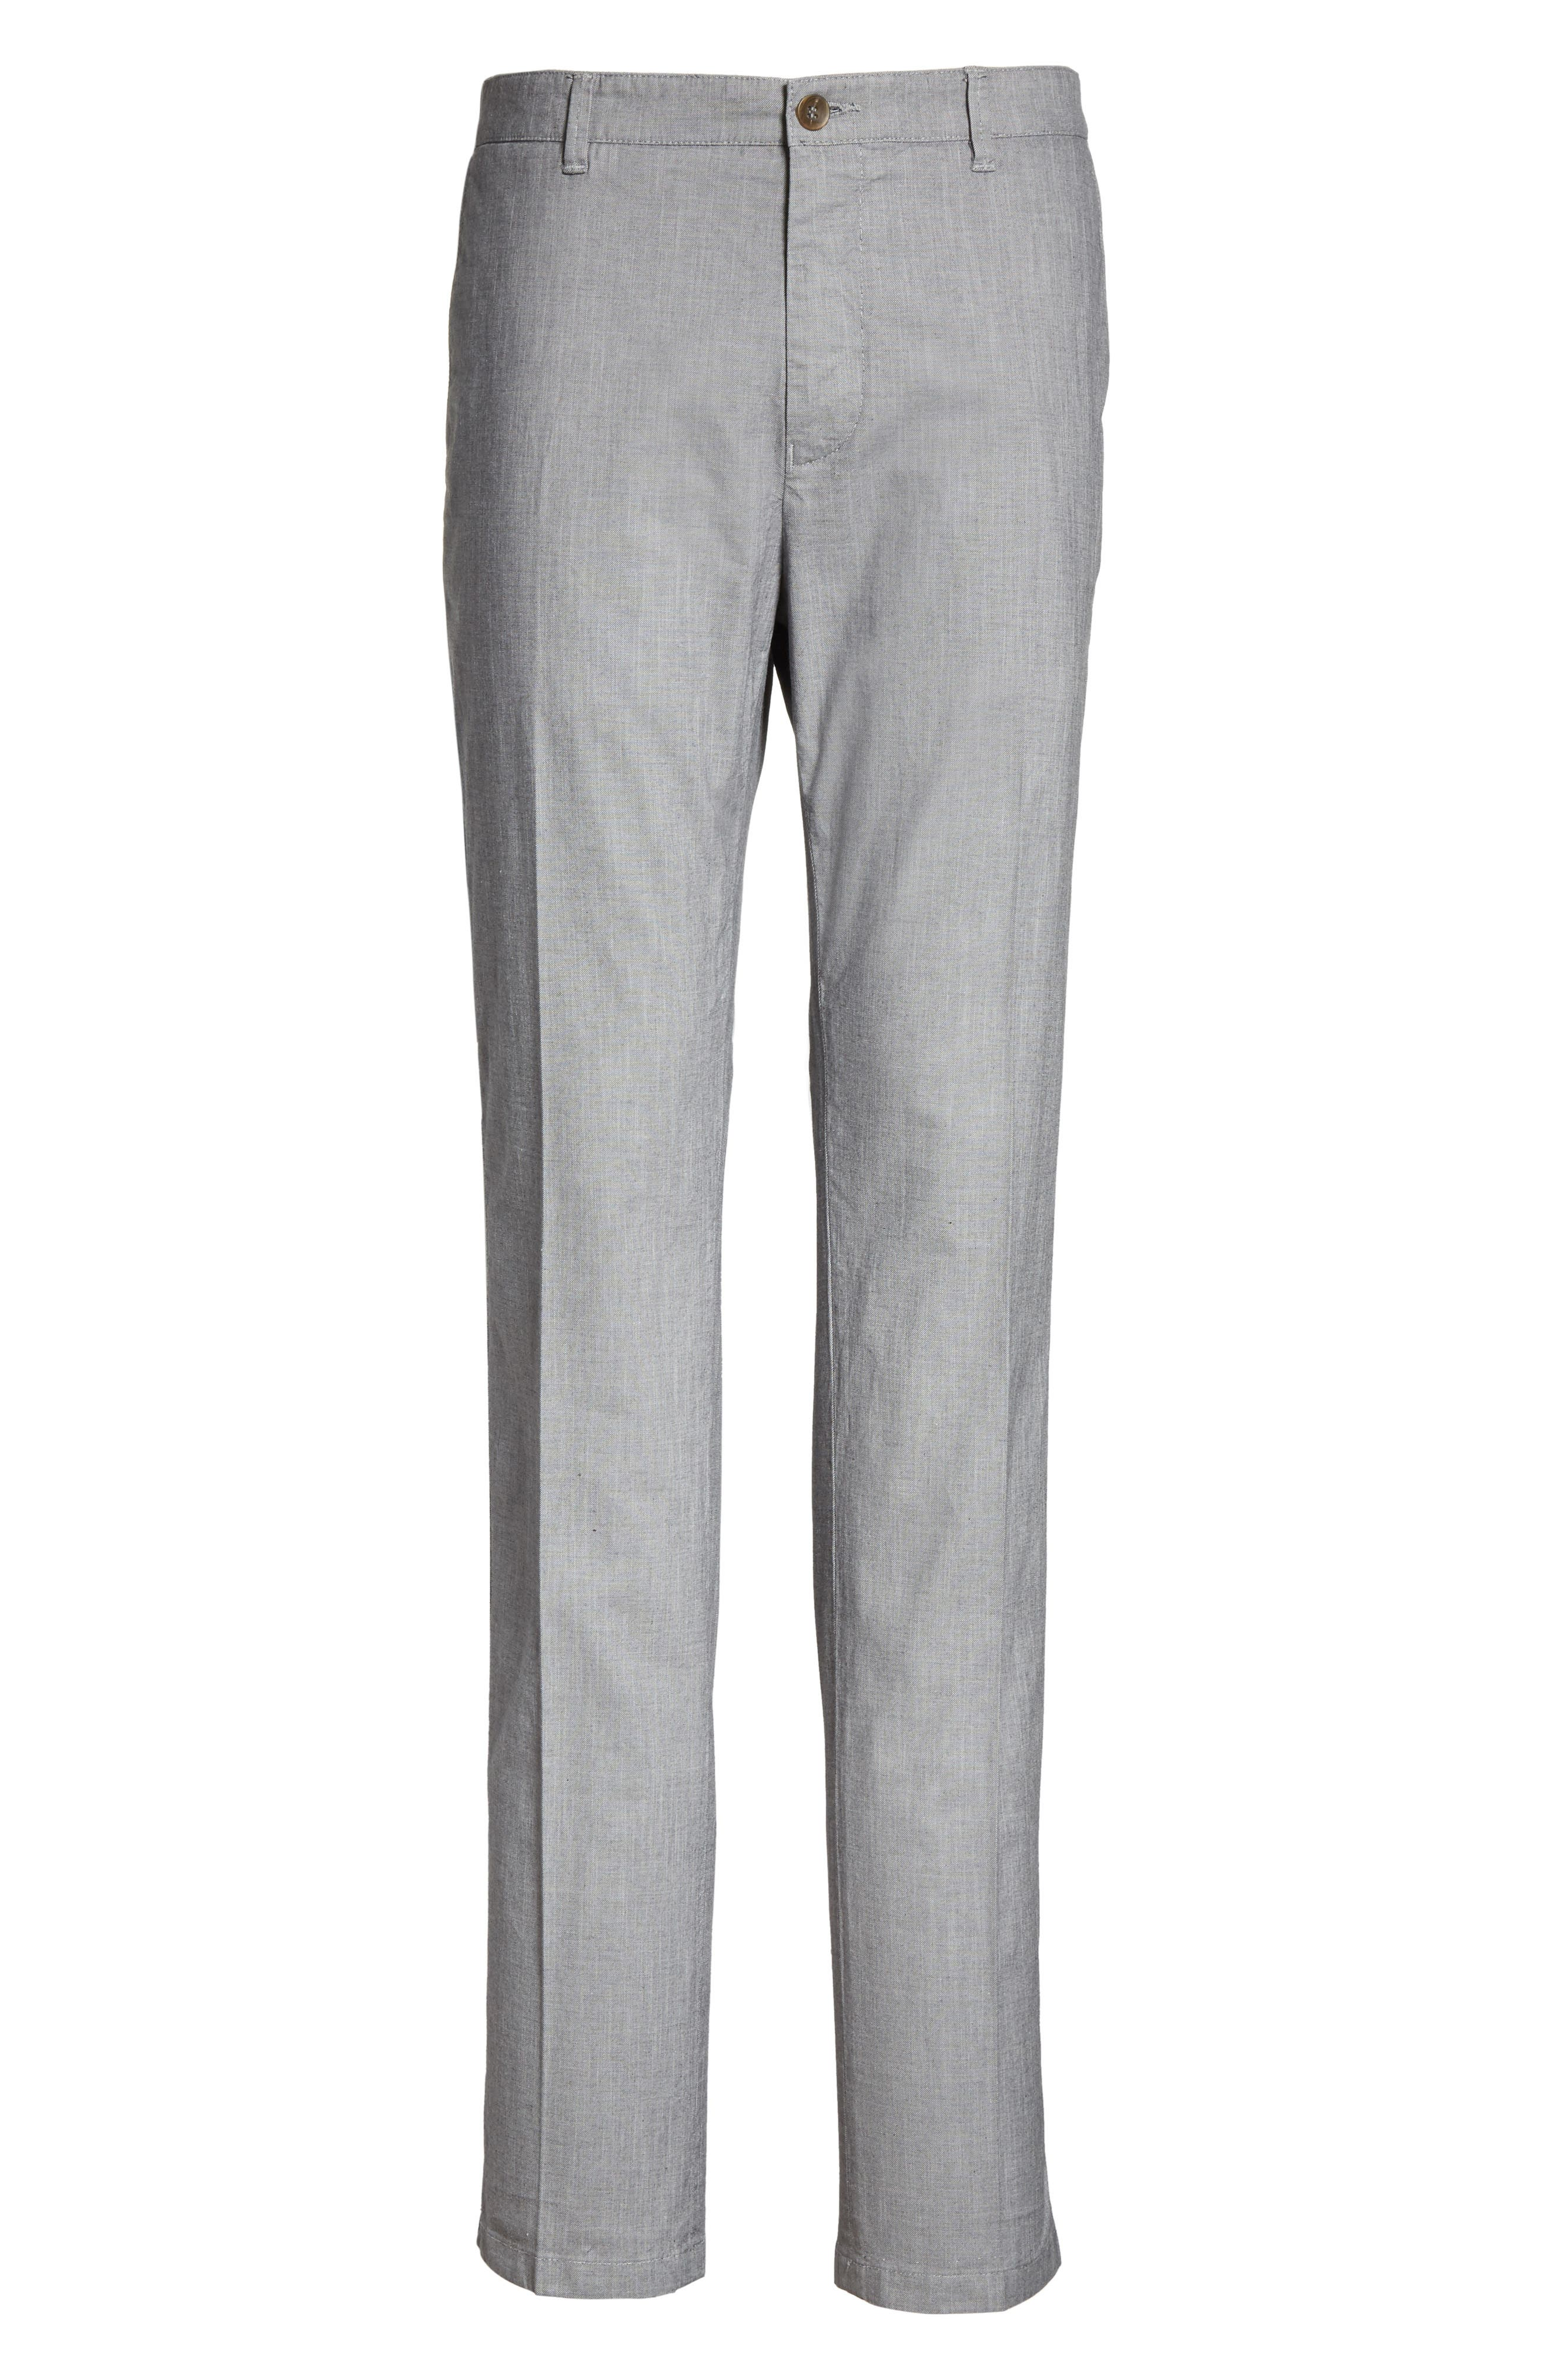 French Pocket Stretch Straight Leg Pants,                             Alternate thumbnail 6, color,                             Grey